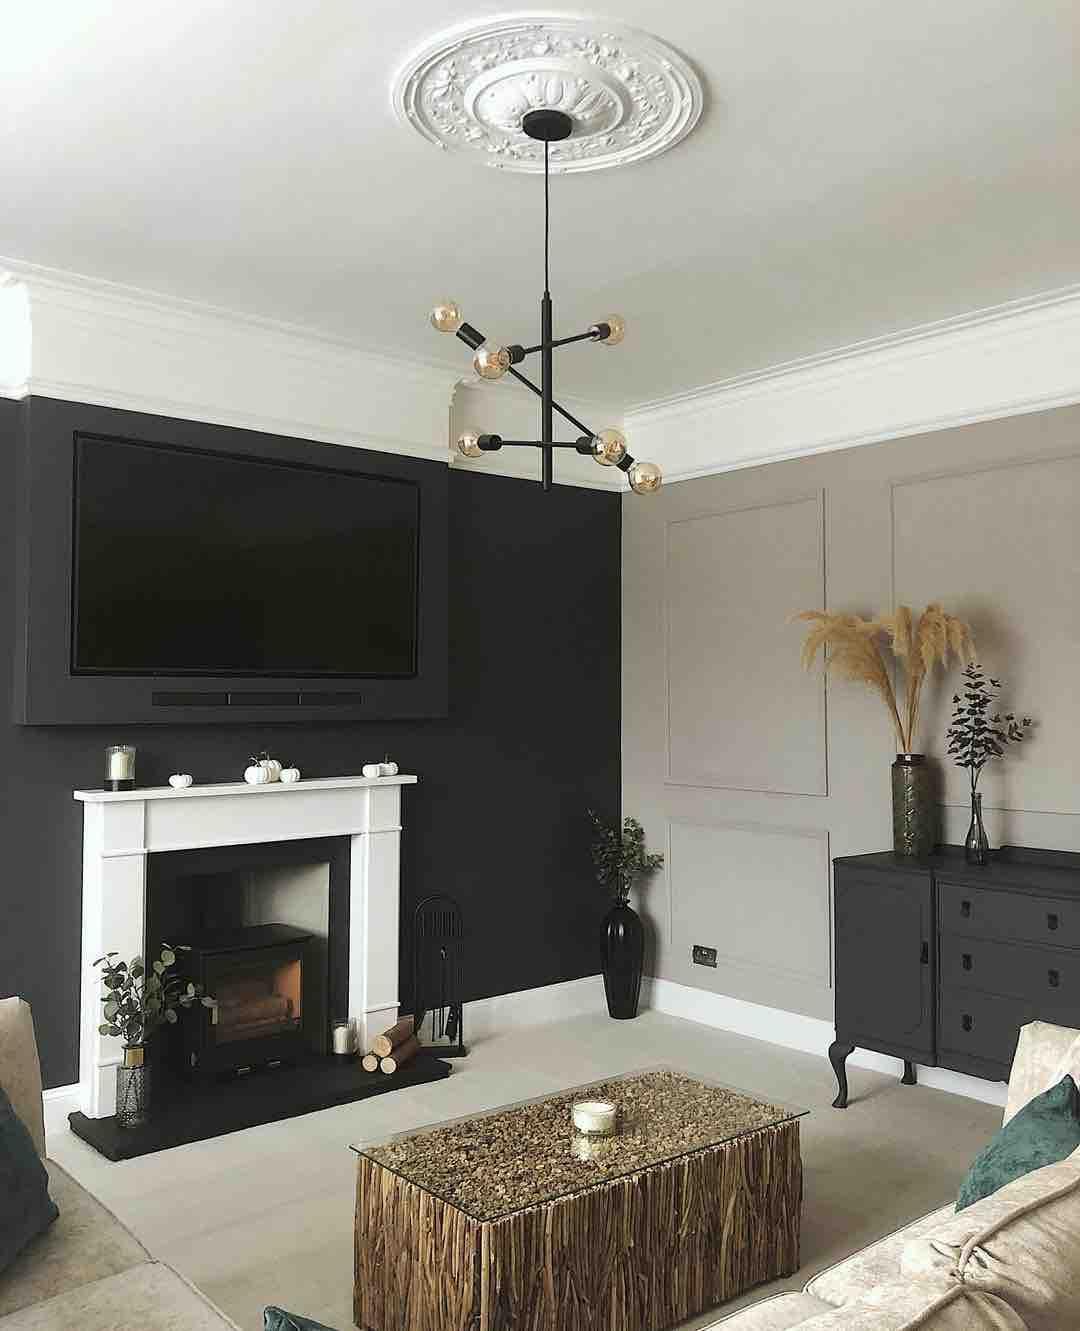 Woodburner Fireplace Ideas Design And Decor Inspiration